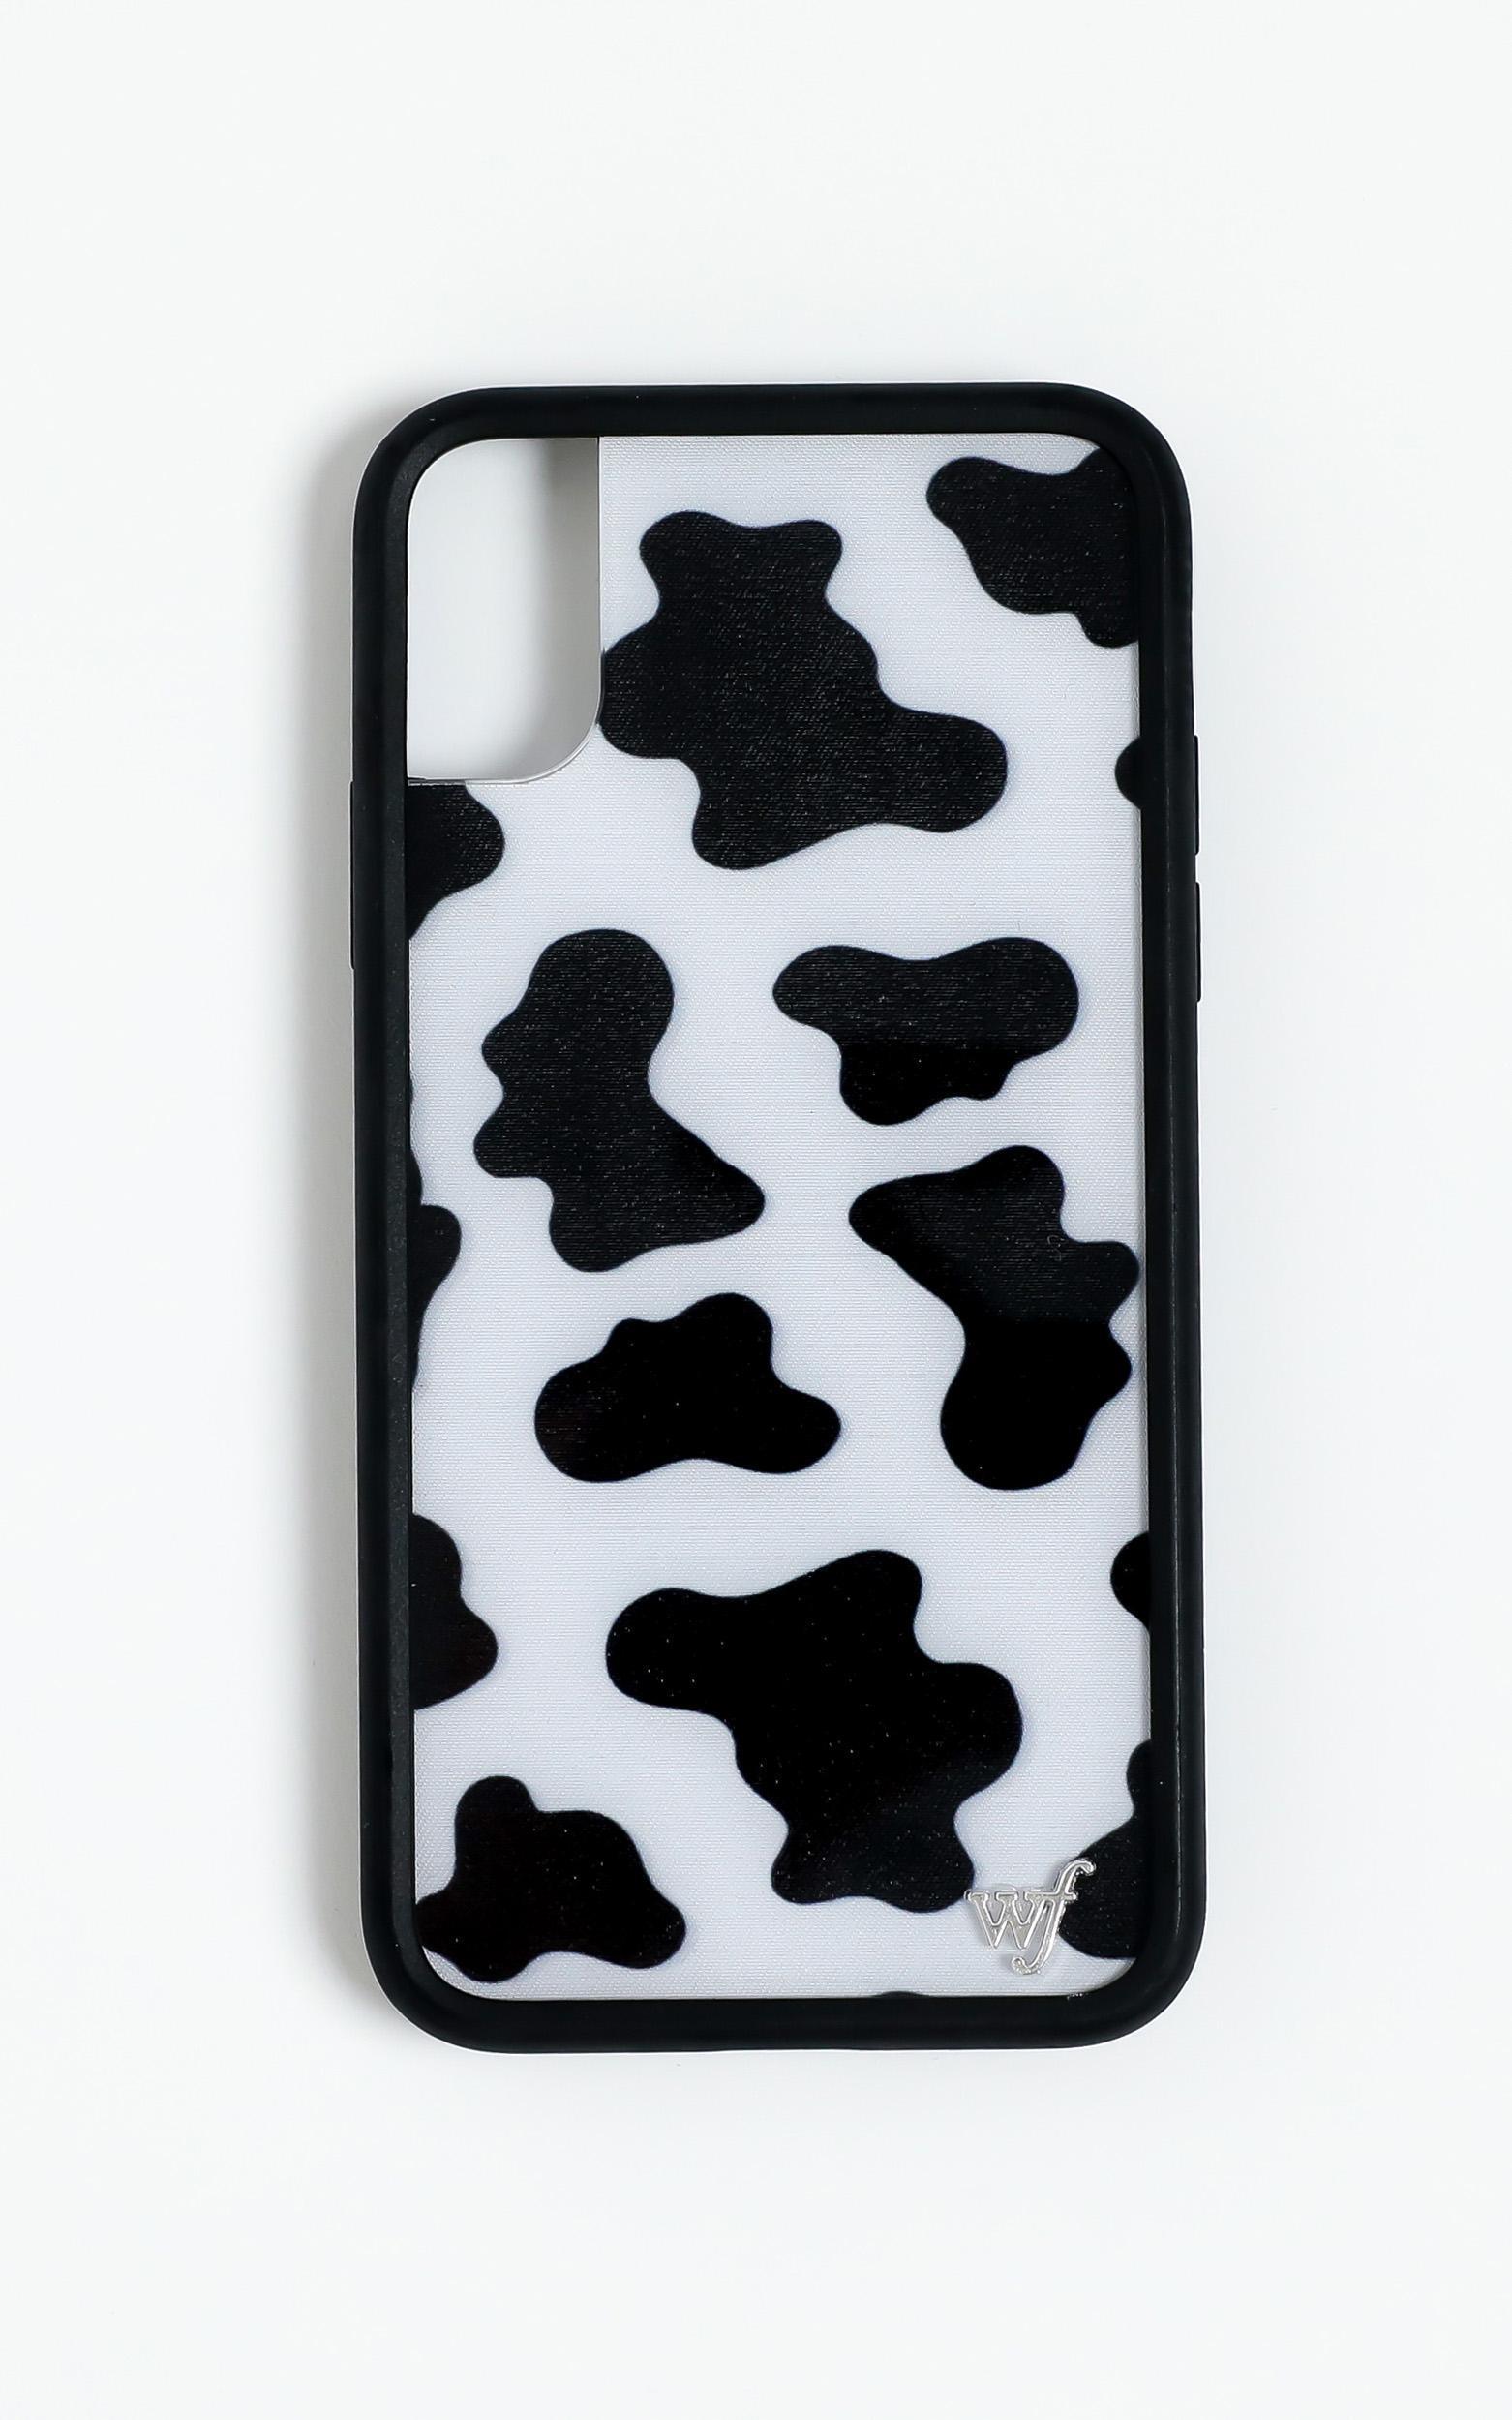 Wildflower - Iphone Case in Moo Moo - 8, Multi, hi-res image number null